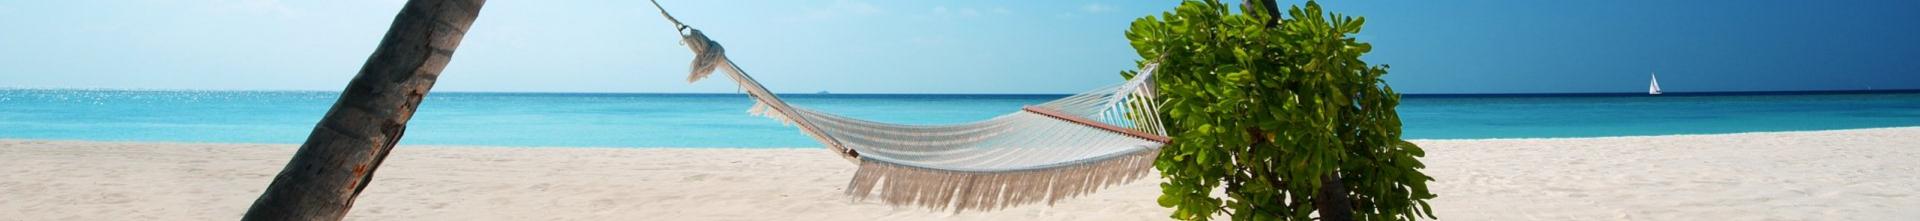 Maldivler Yerel Ada Turu